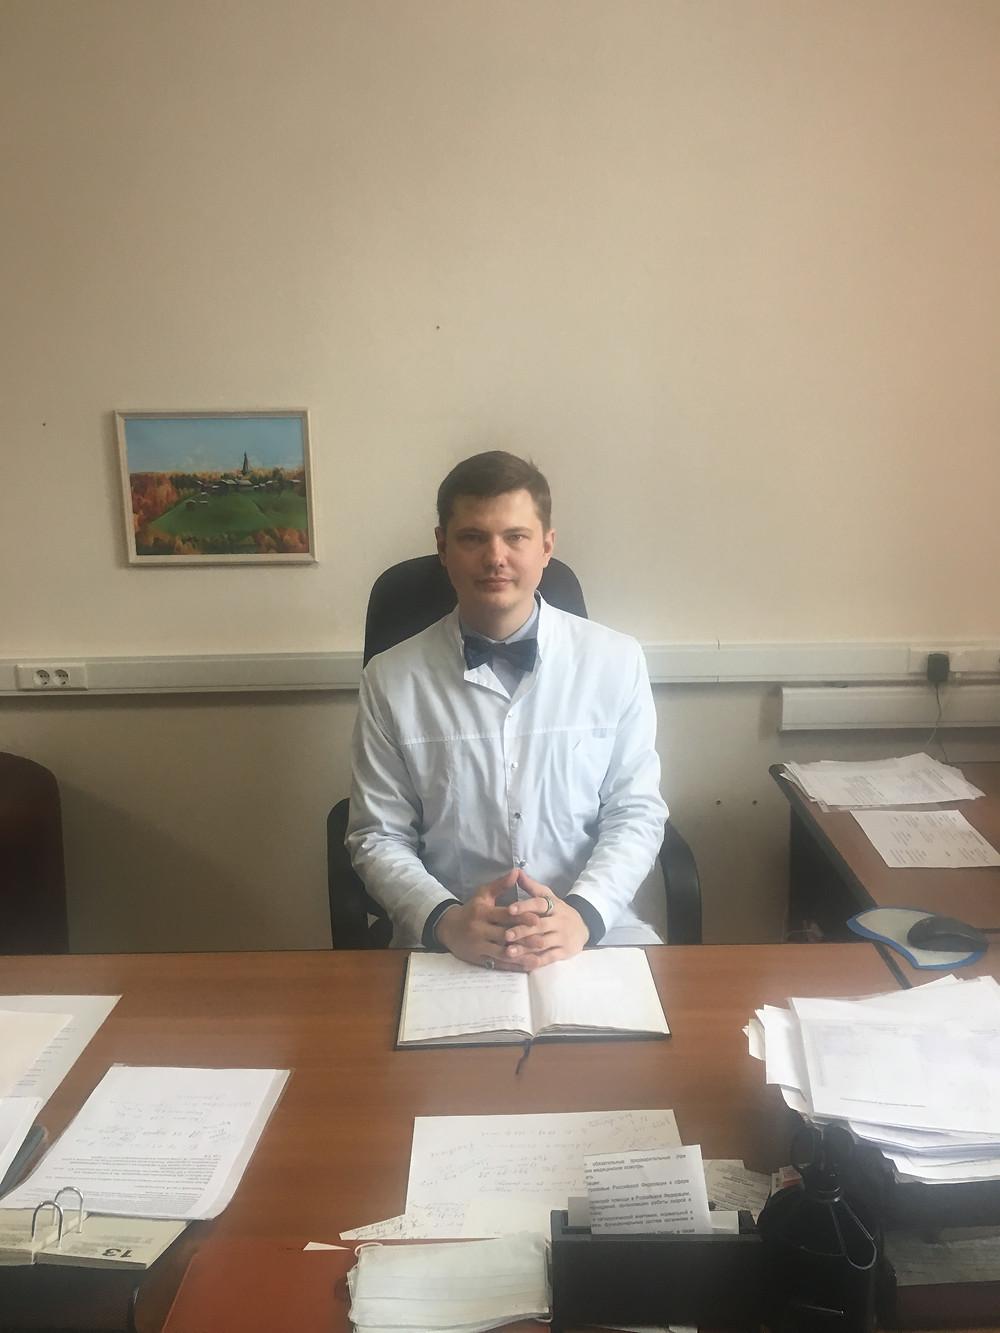 Коренский, отедел реабилитации, врач психиатр, нарколог. ННЦН, Москва